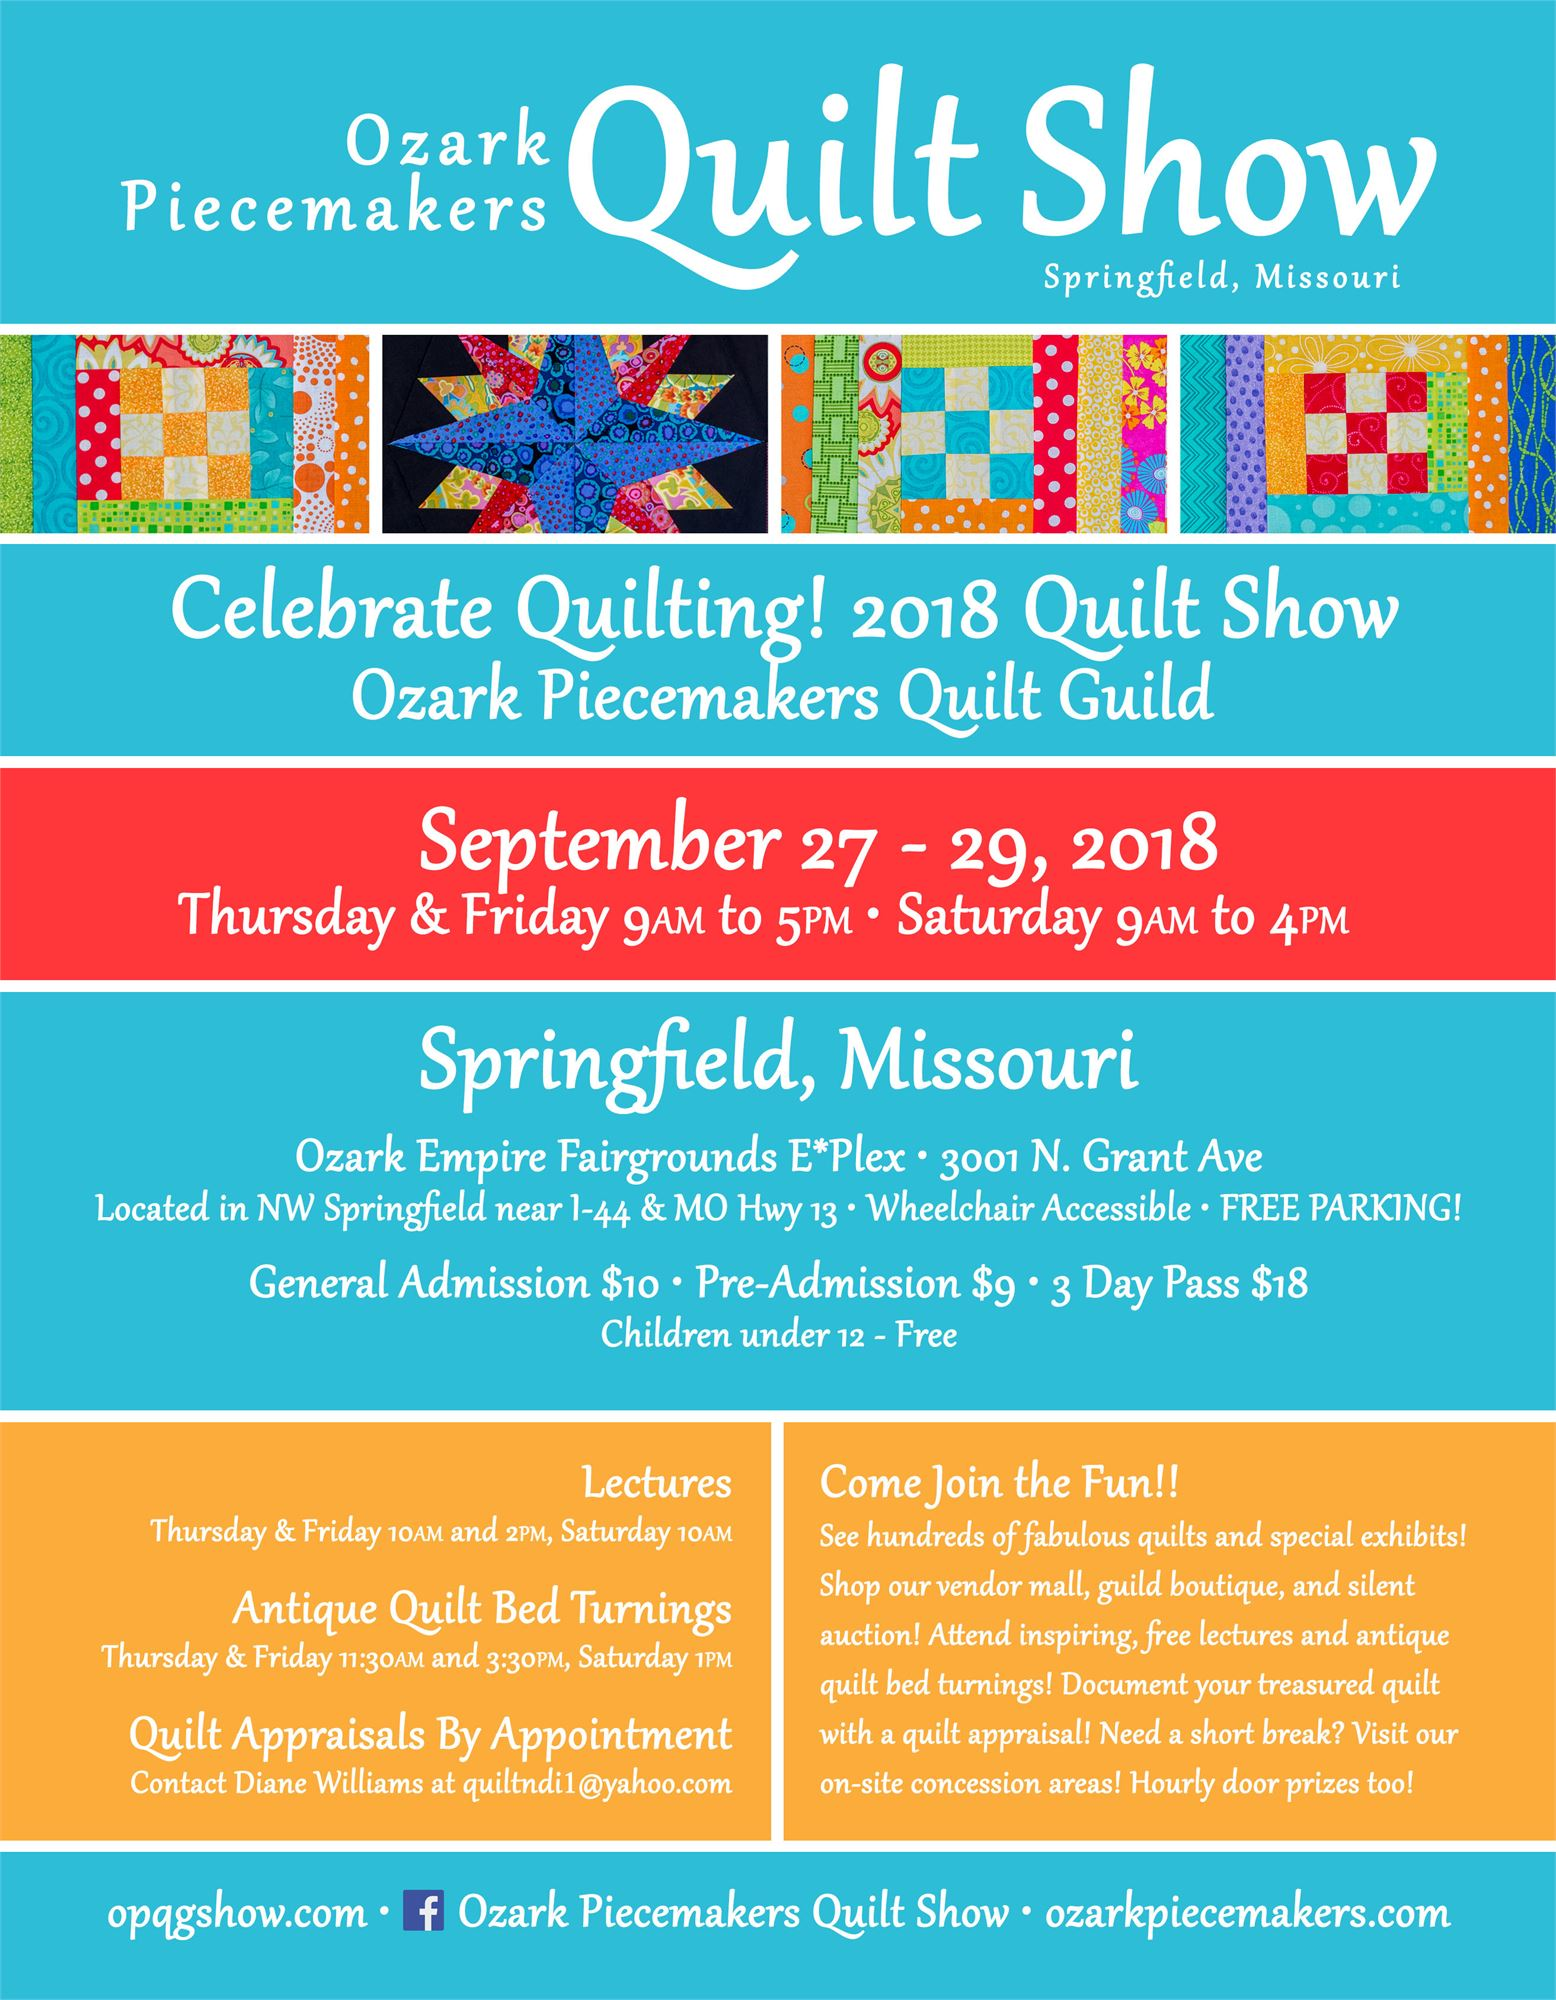 Ozarks Piecemakers Quilt Guild